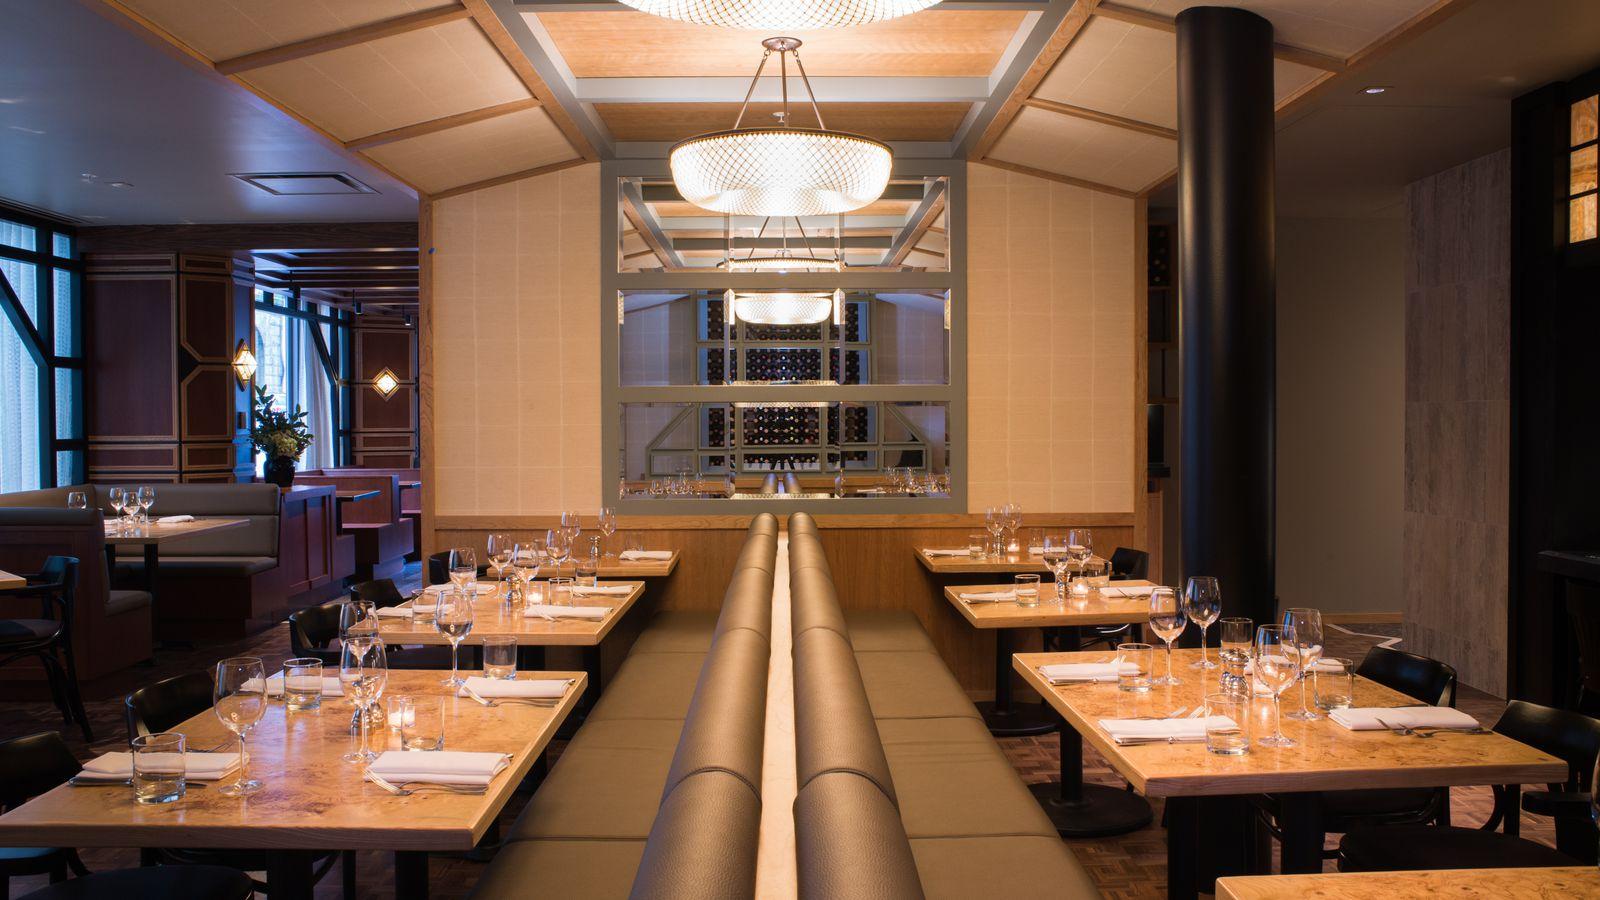 Get a Sneak Peek Inside Q Restaurant, aka Veritable Quandary 'Reborn' -  Eater Portland